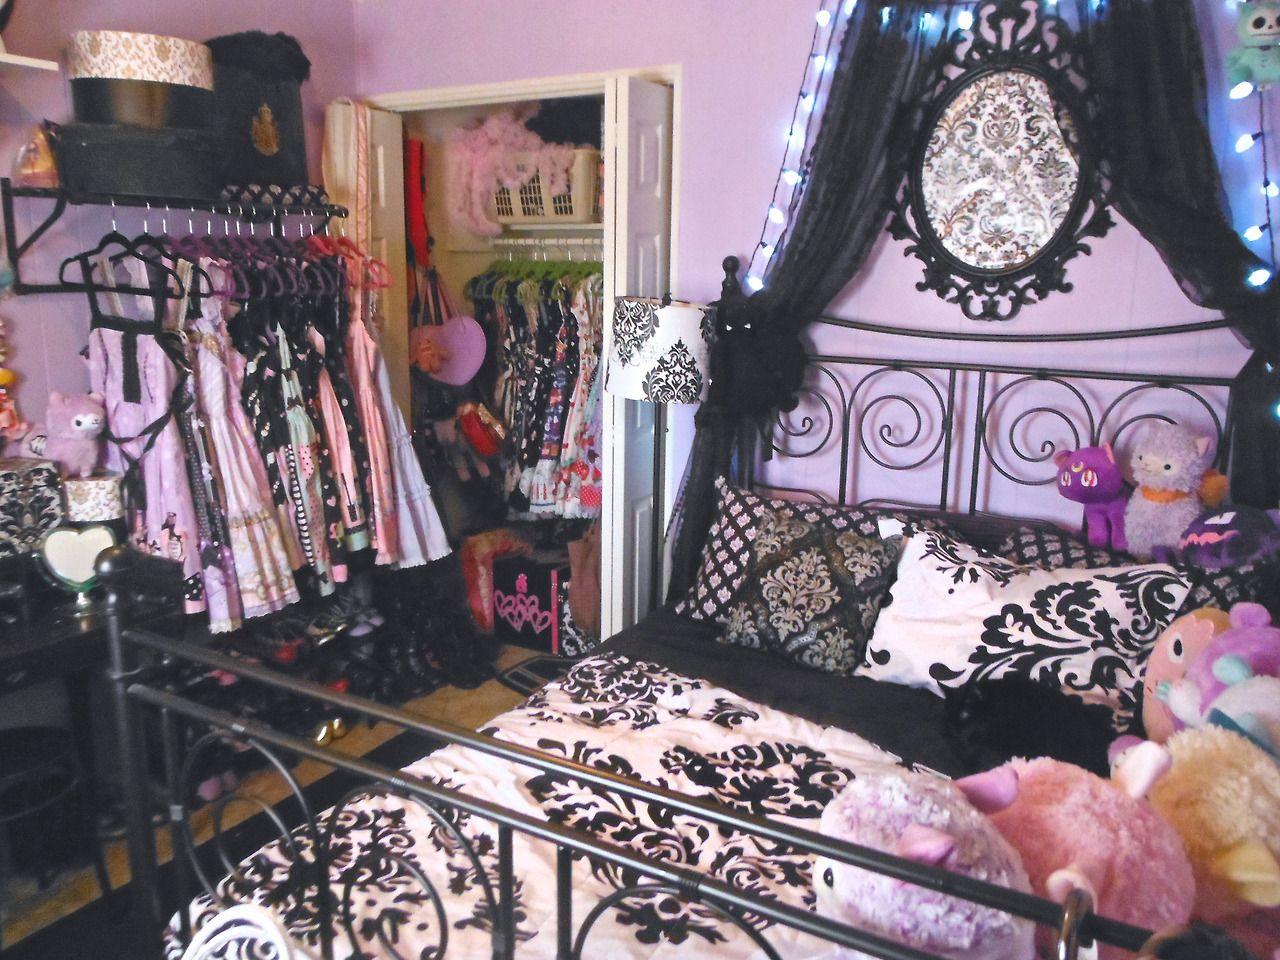 Goth Room jaynejezebelle: my new room is freakin' sweet, if i do say so